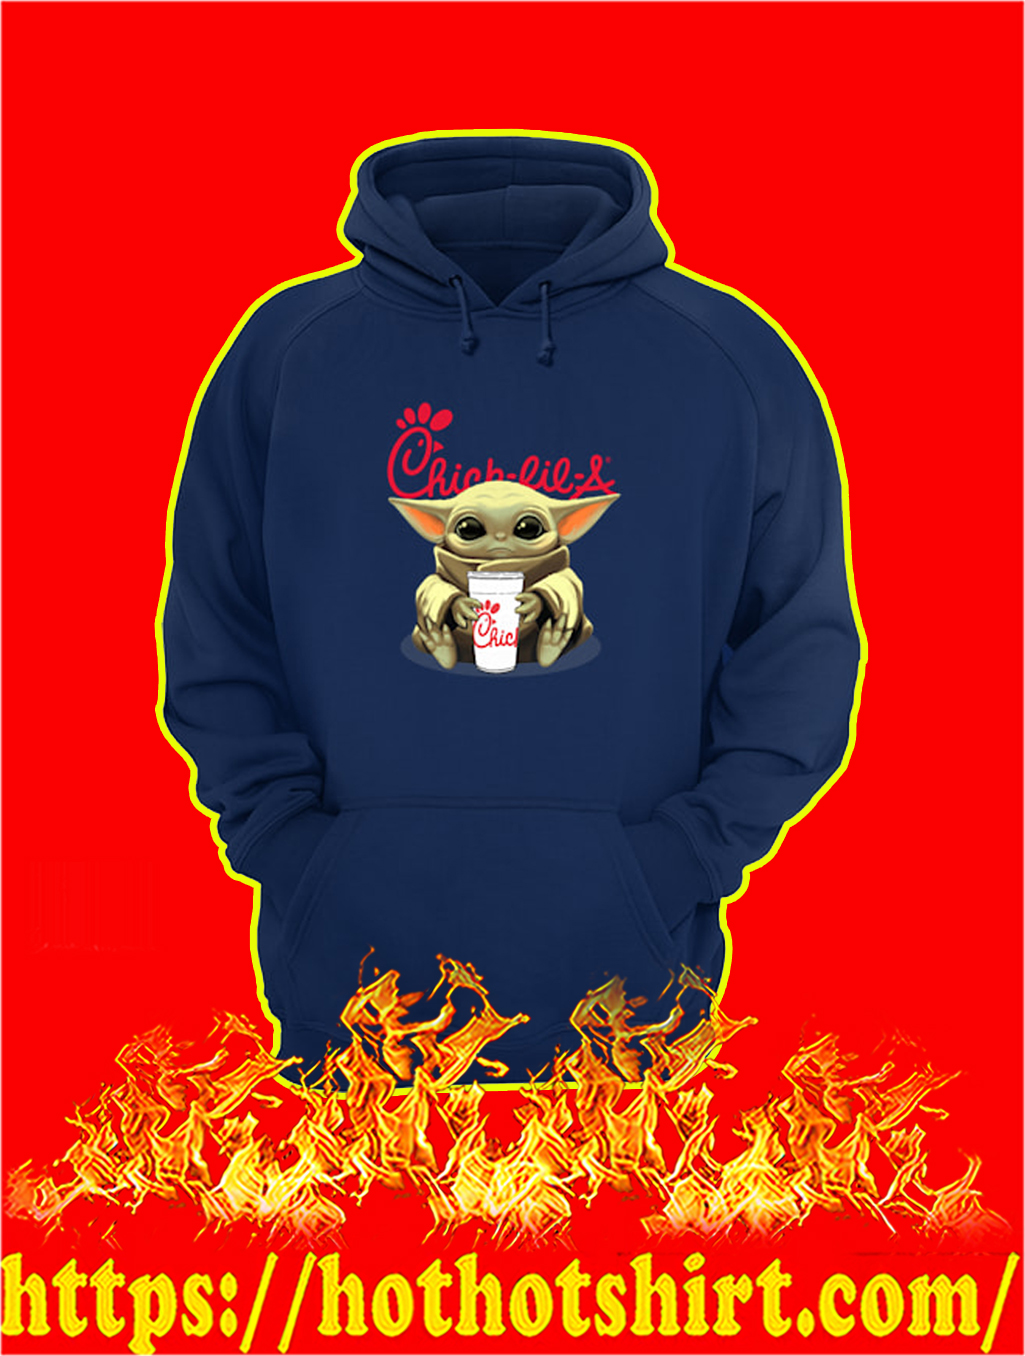 Baby Yoda Hug Chick-fil-A hoodie